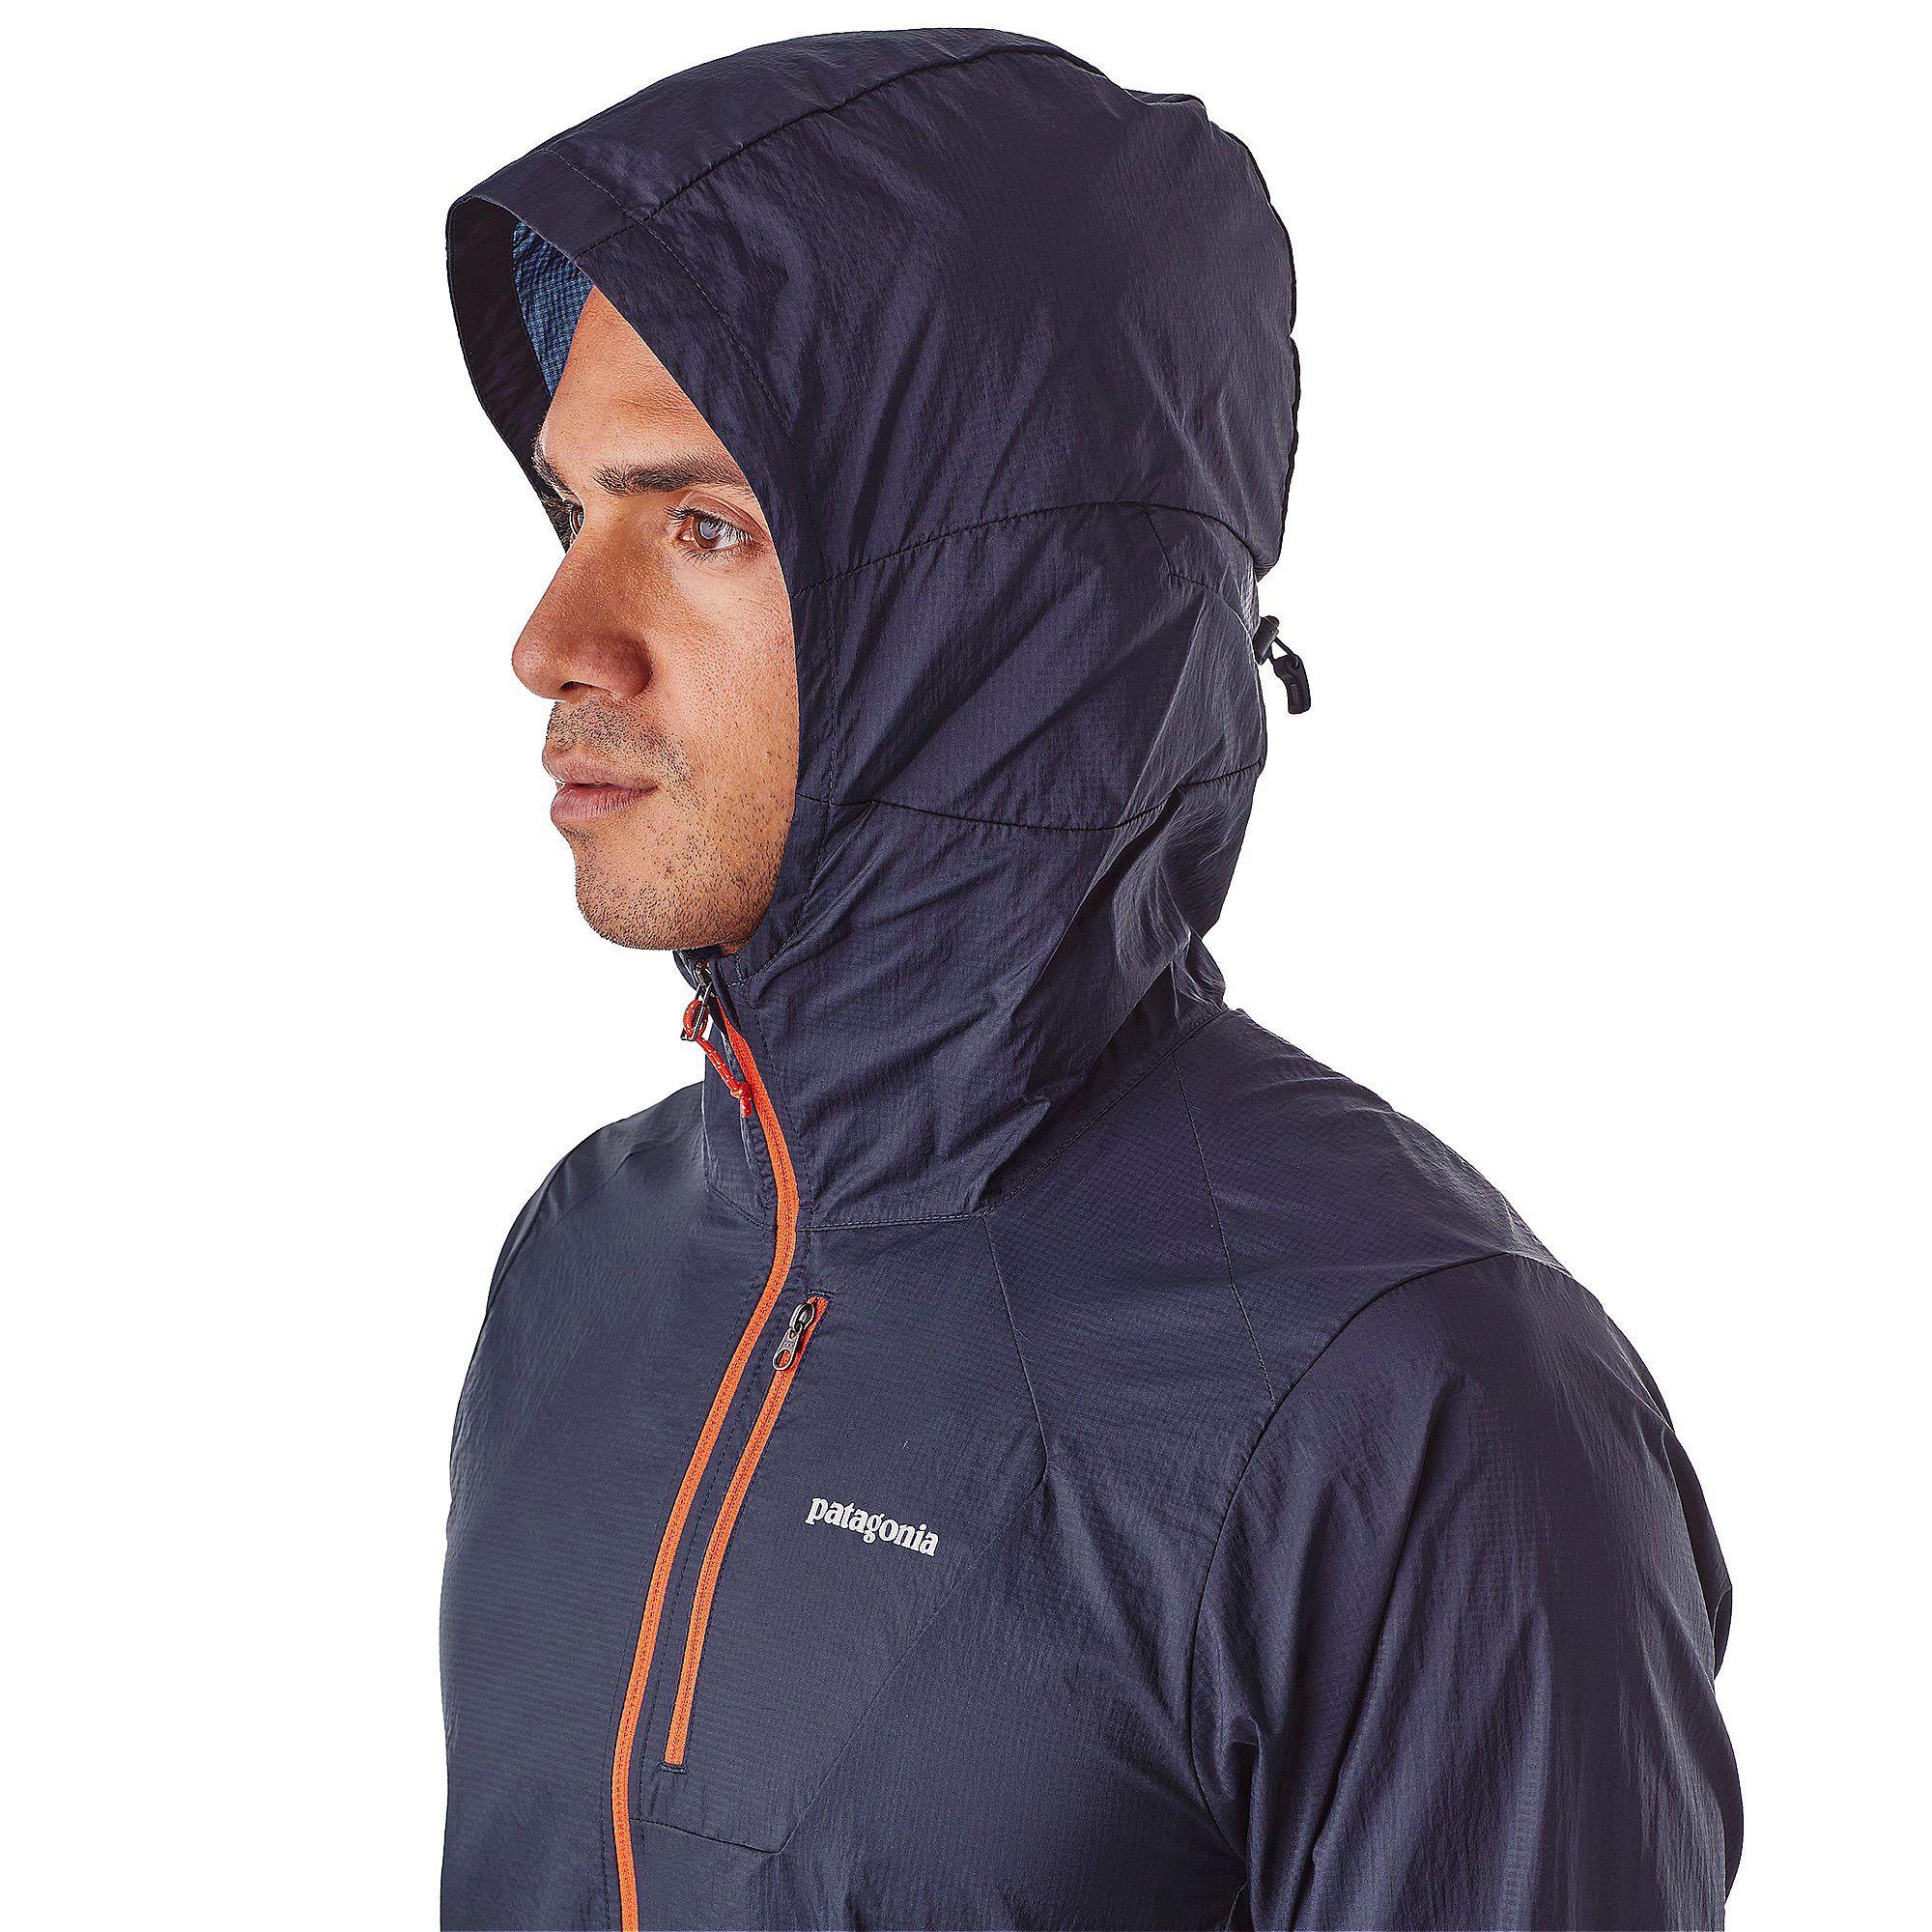 Patagonia Men's Houdini® Jacket Windbreaker Jacket